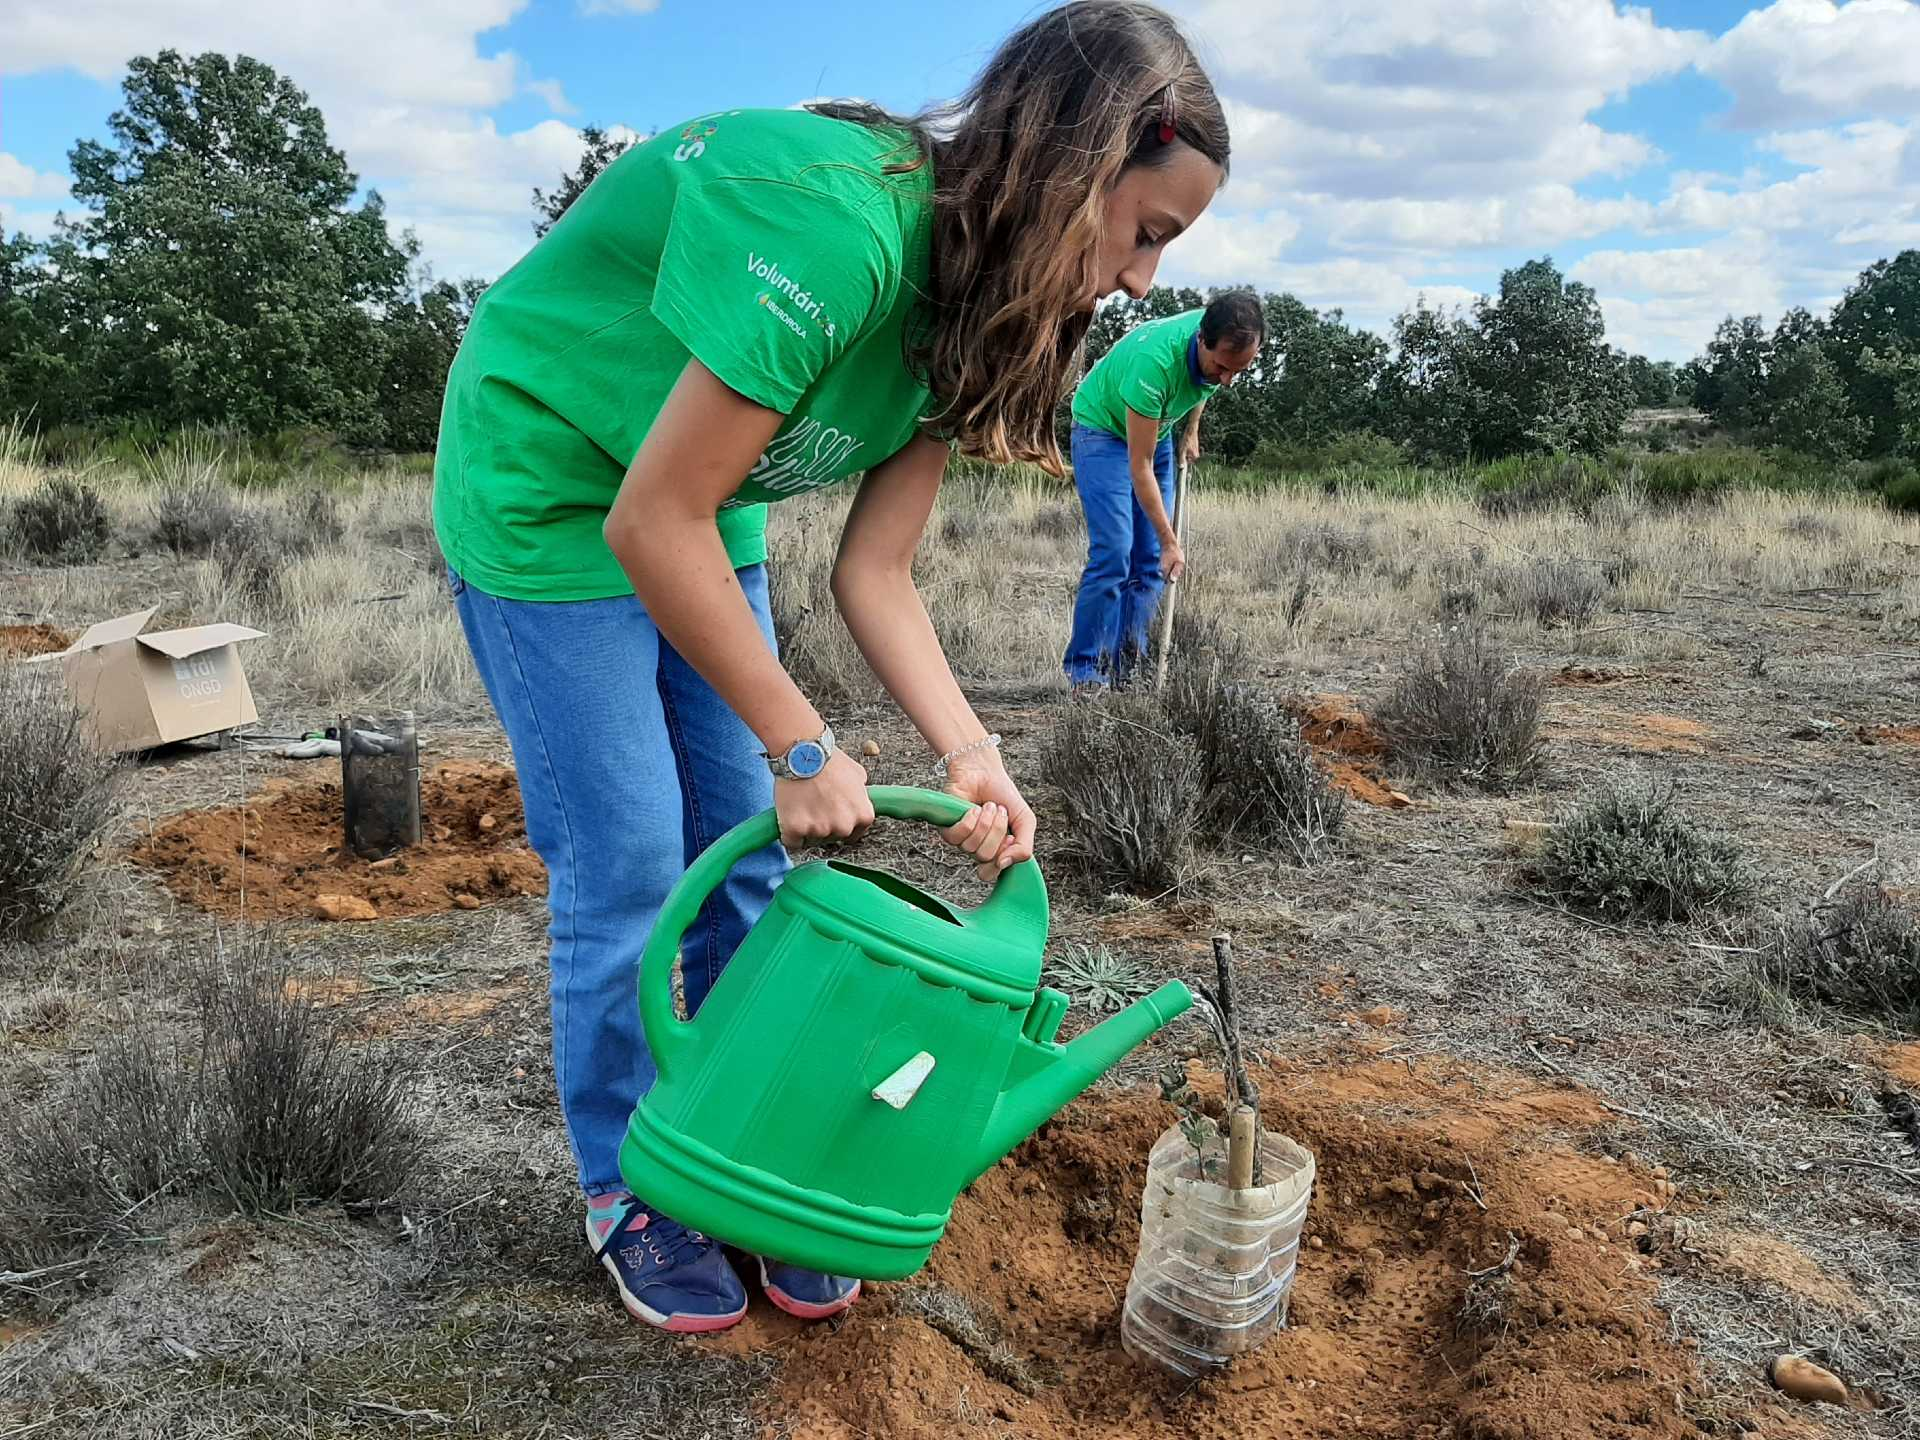 Iberdrola involves 5,000 volunteers on the International Volunteer Day